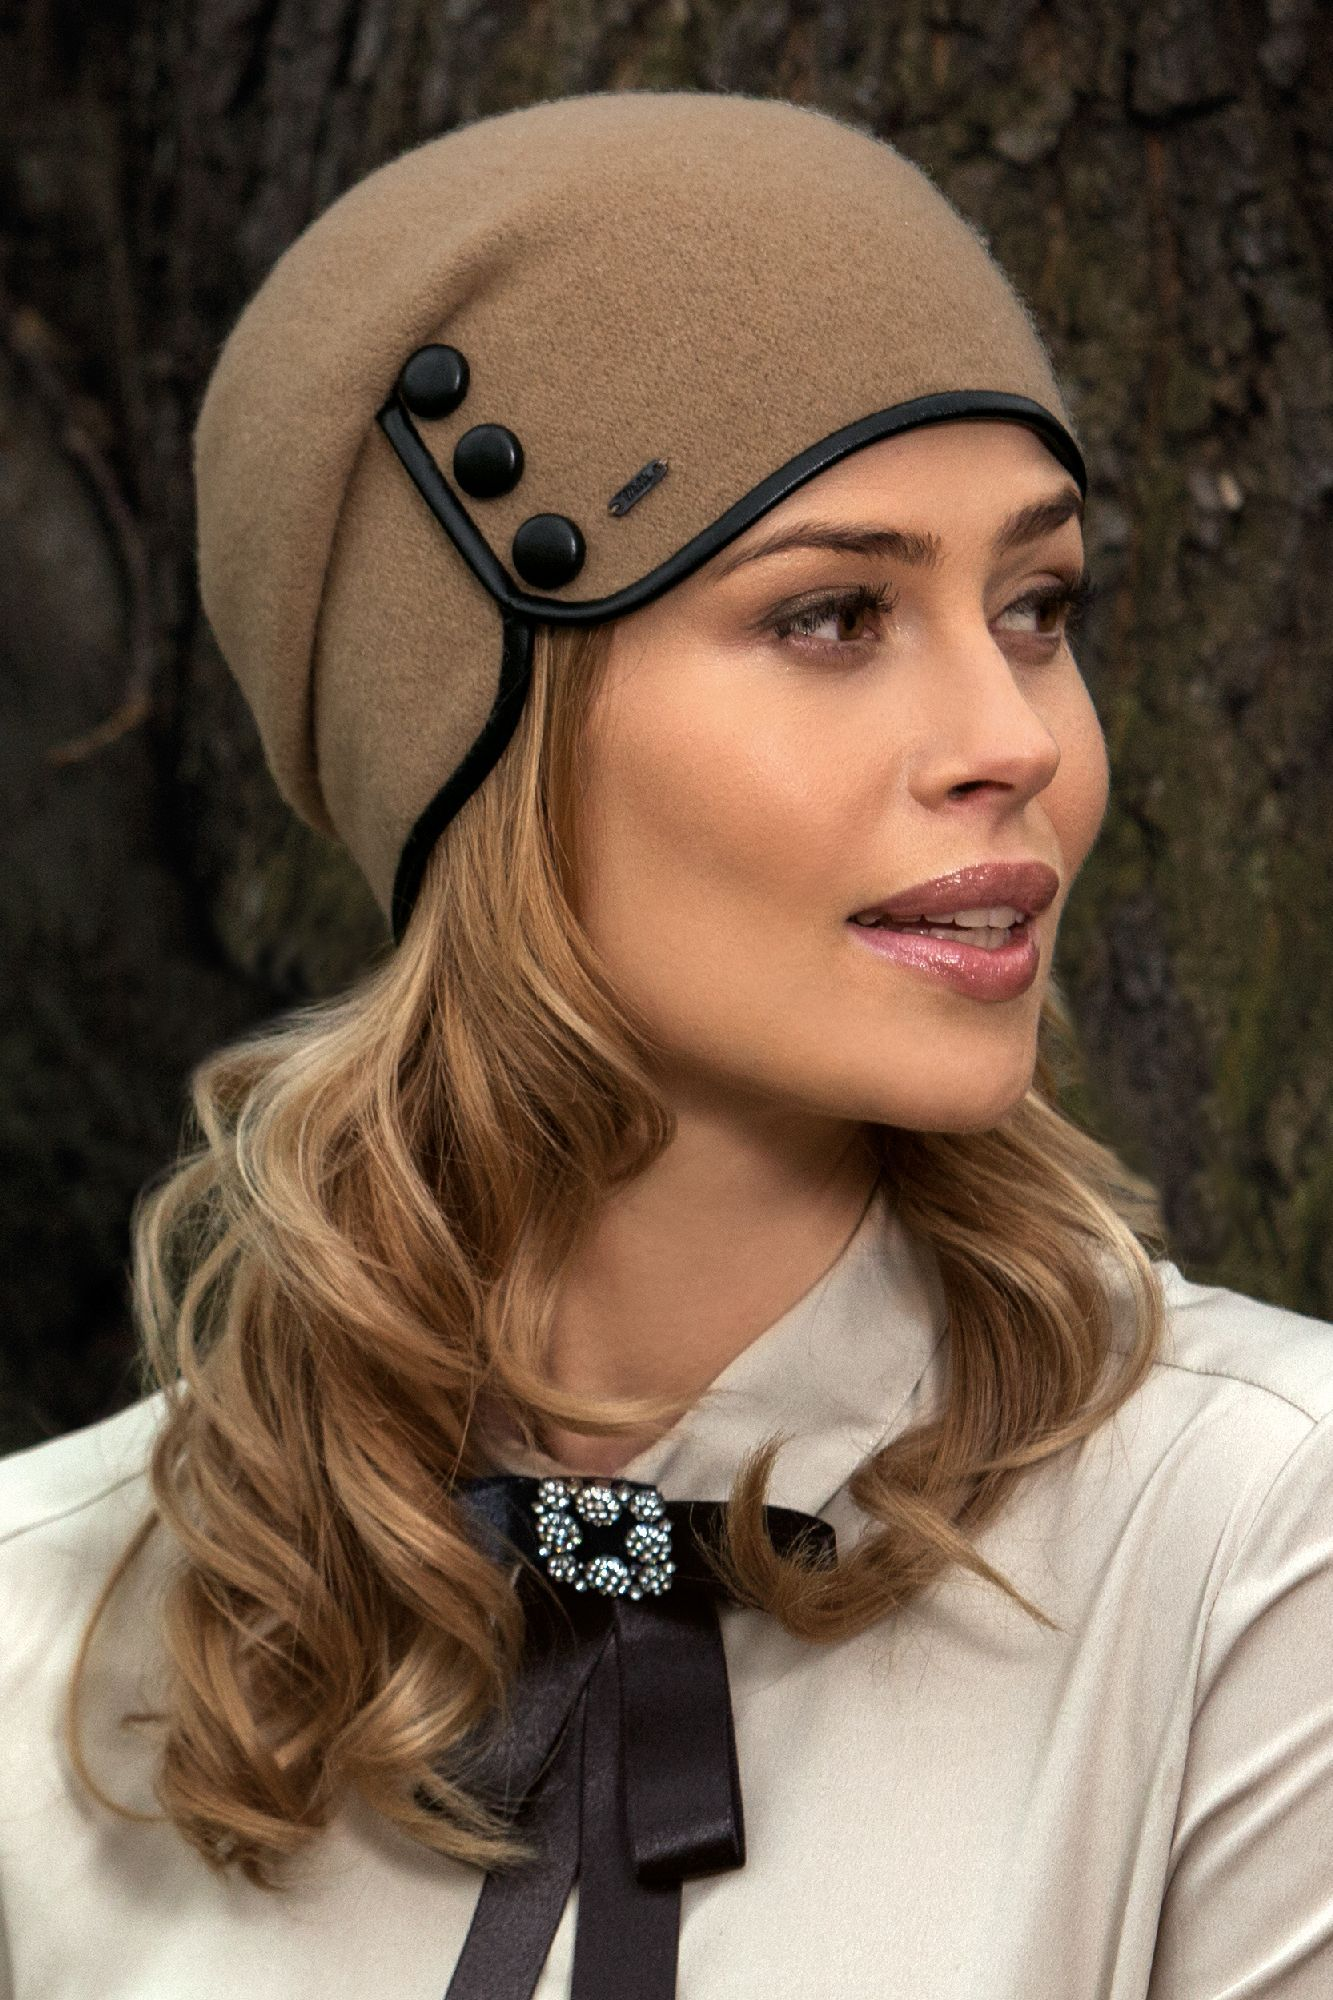 Ladies Hat Applique  Patch Iron On New Bonnet Women's Hat Fashion Brown Green